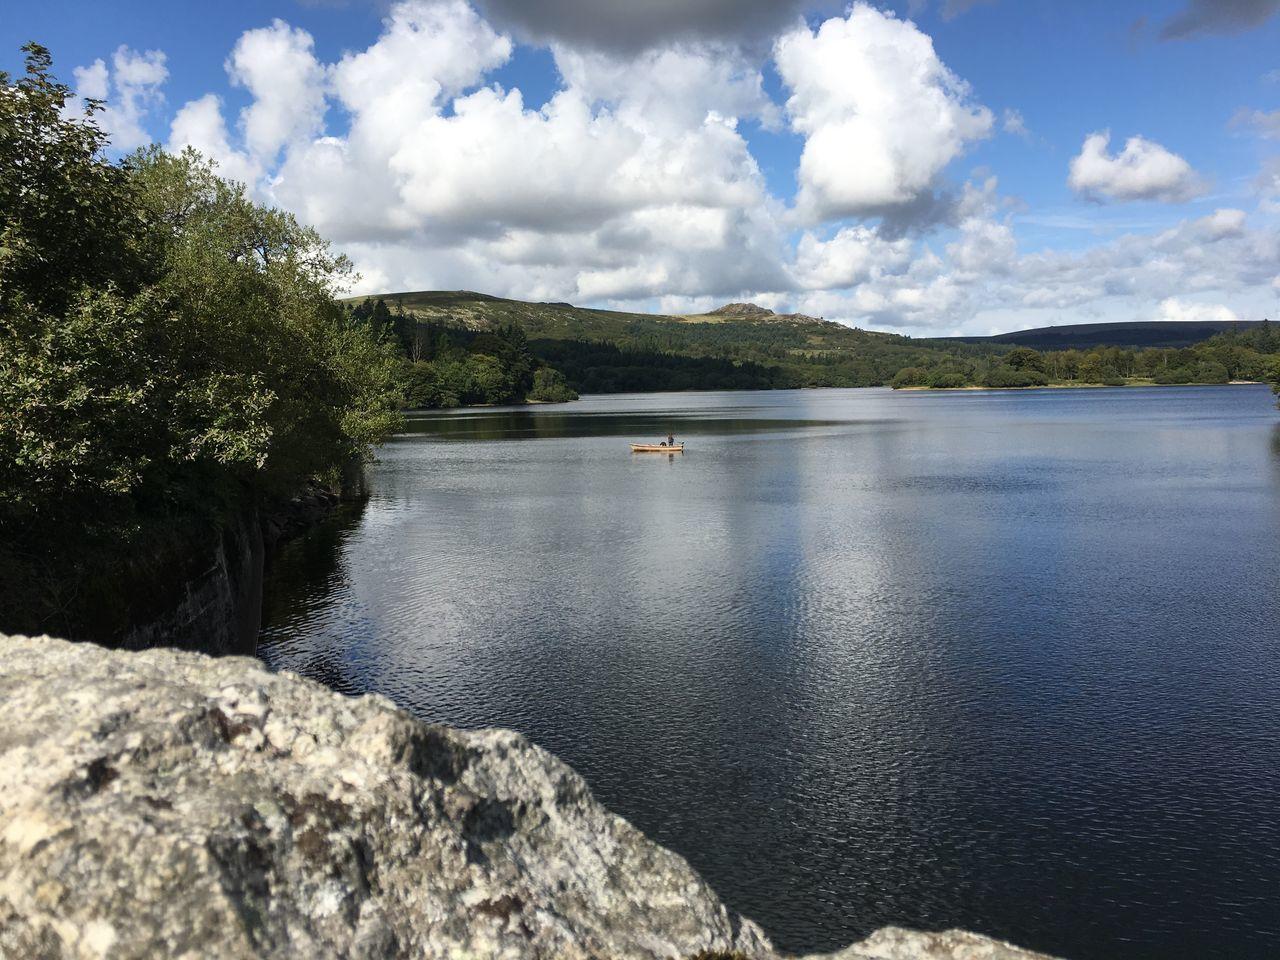 Burrator Reservoir Burrator Reservoir Nature Water Sky Scenics Beauty In Nature Cloud - Sky Tranquil Scene EyeEmNewHere